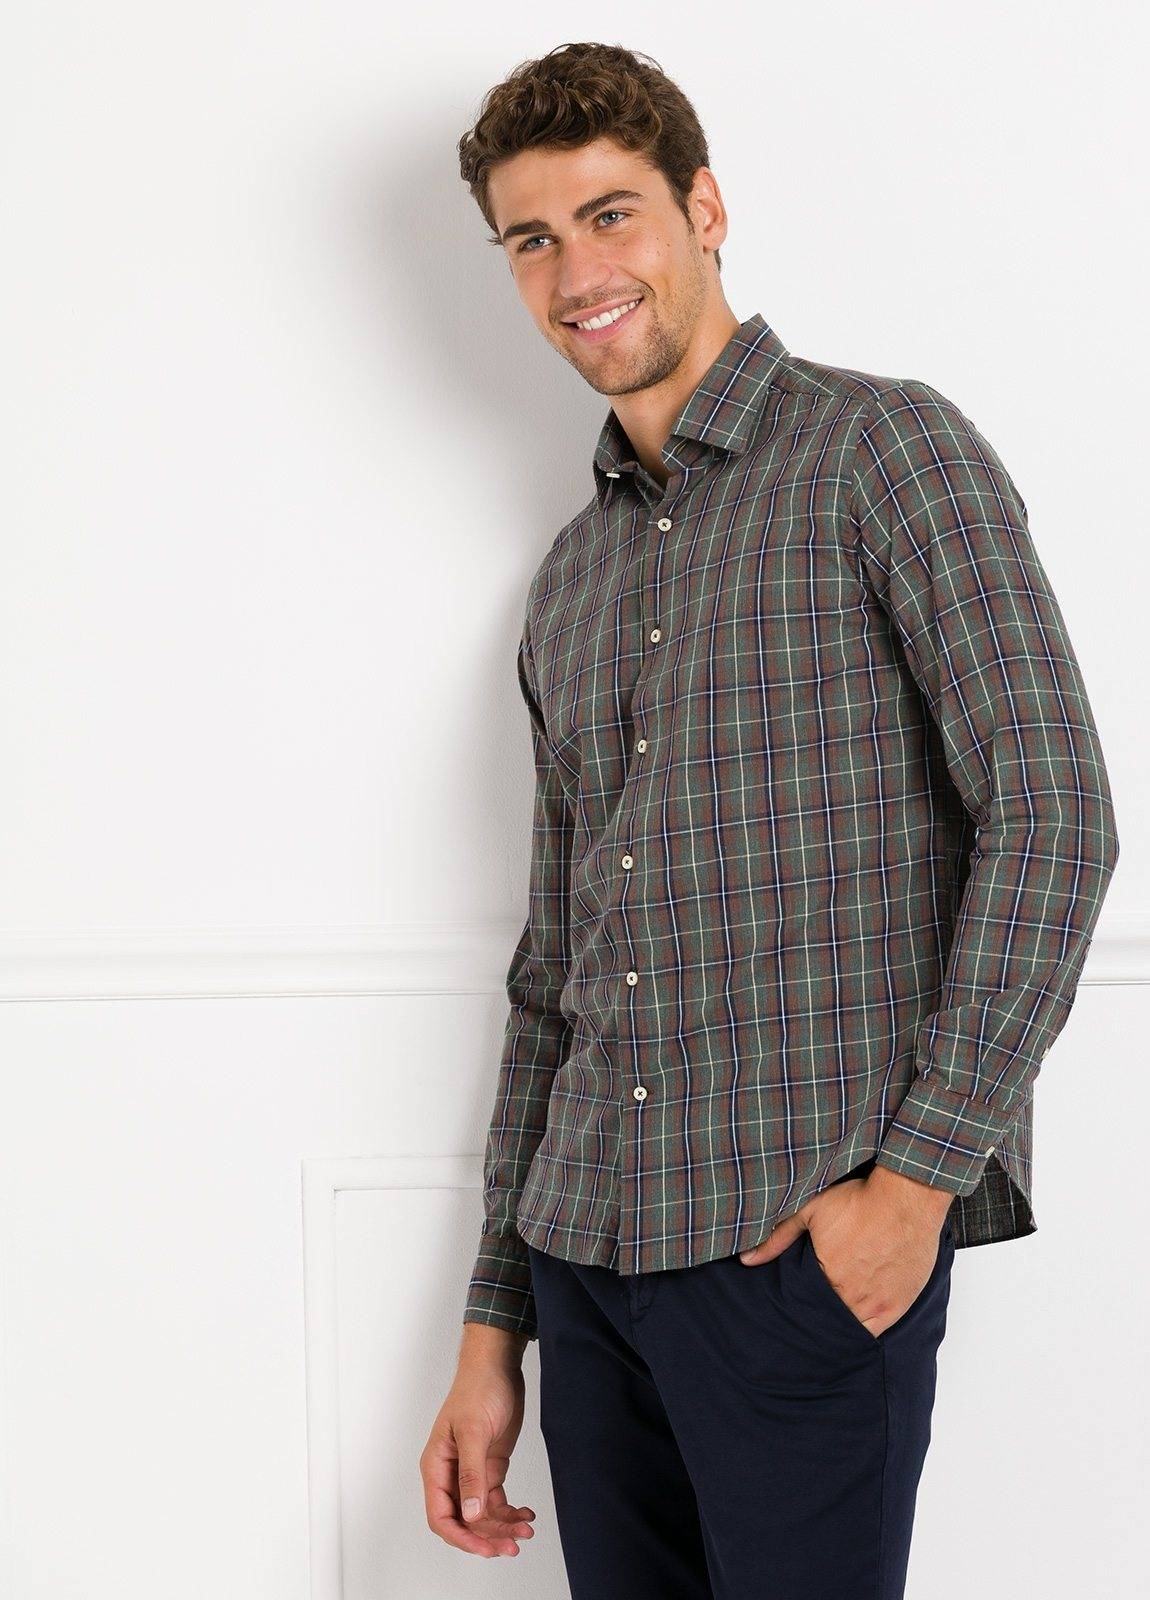 Camisa Leisure Wear REGULAR FIT modelo PORTO, cuadros gris, teja. 100% Algodón.